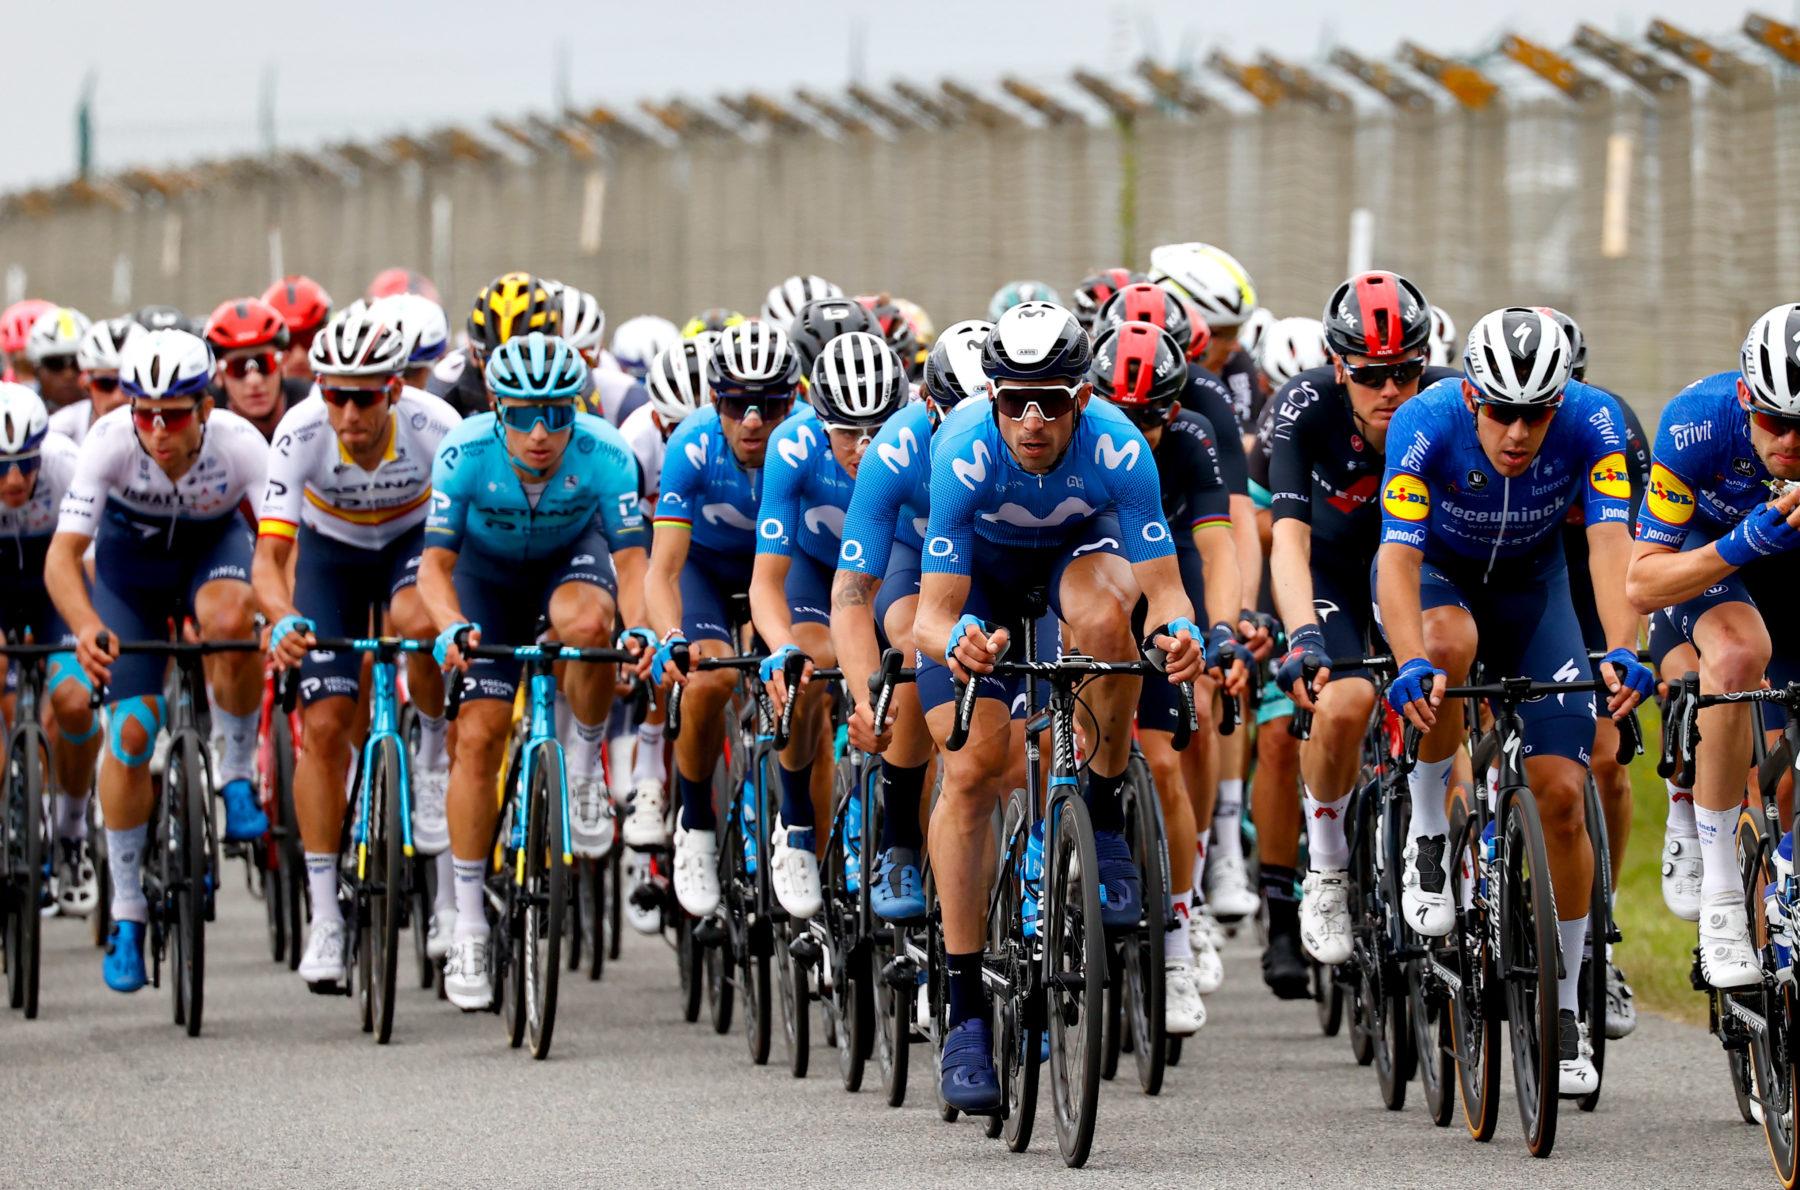 Imagen de la noticia 'Soler out of Tour after stage one crash; Enric Mas within main contenders'